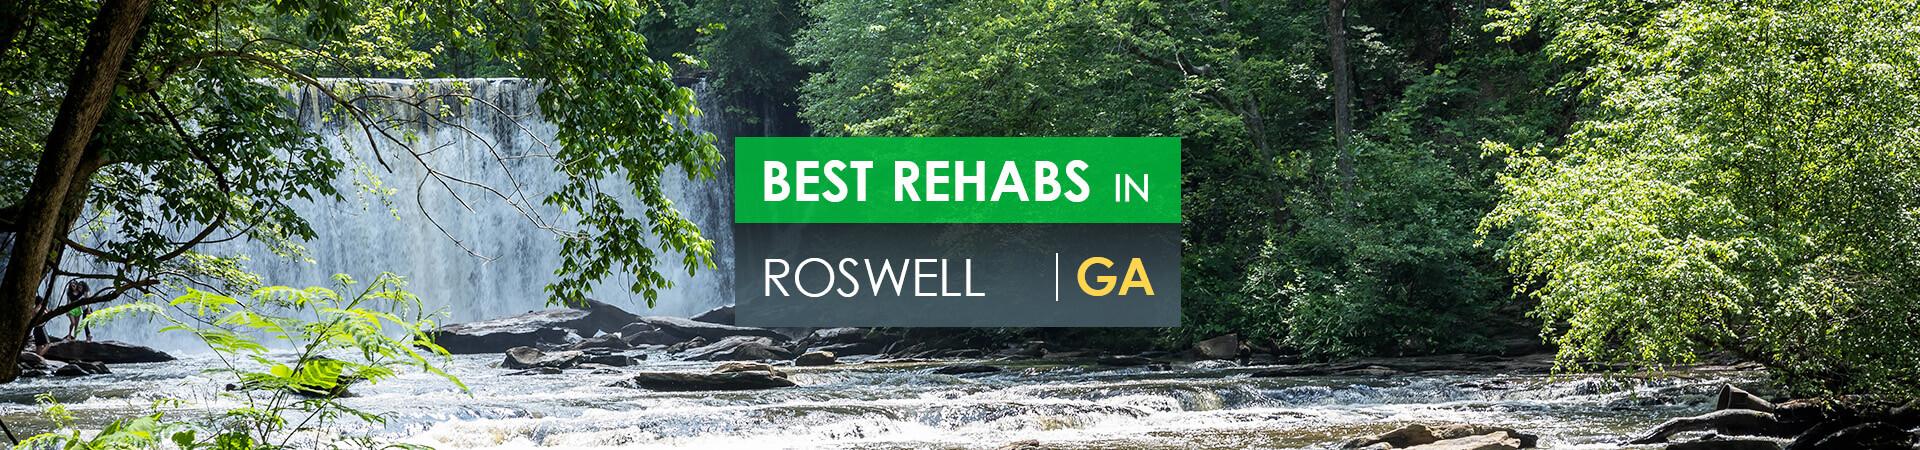 Best rehabs in Roswell, GA